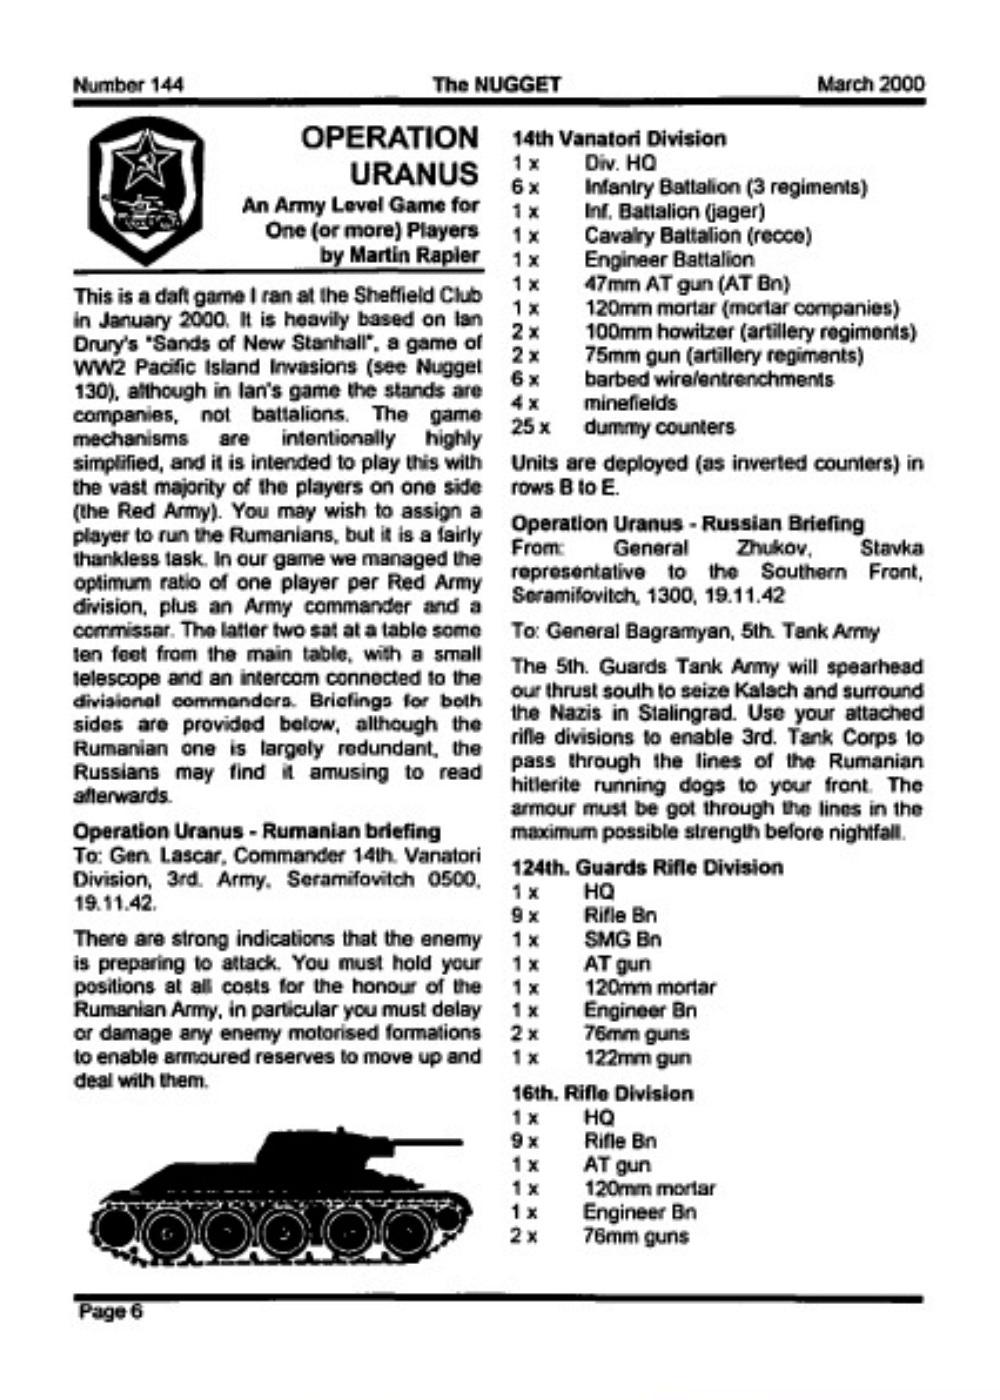 Wargaming Miscellany: Operation Uranus: A development of